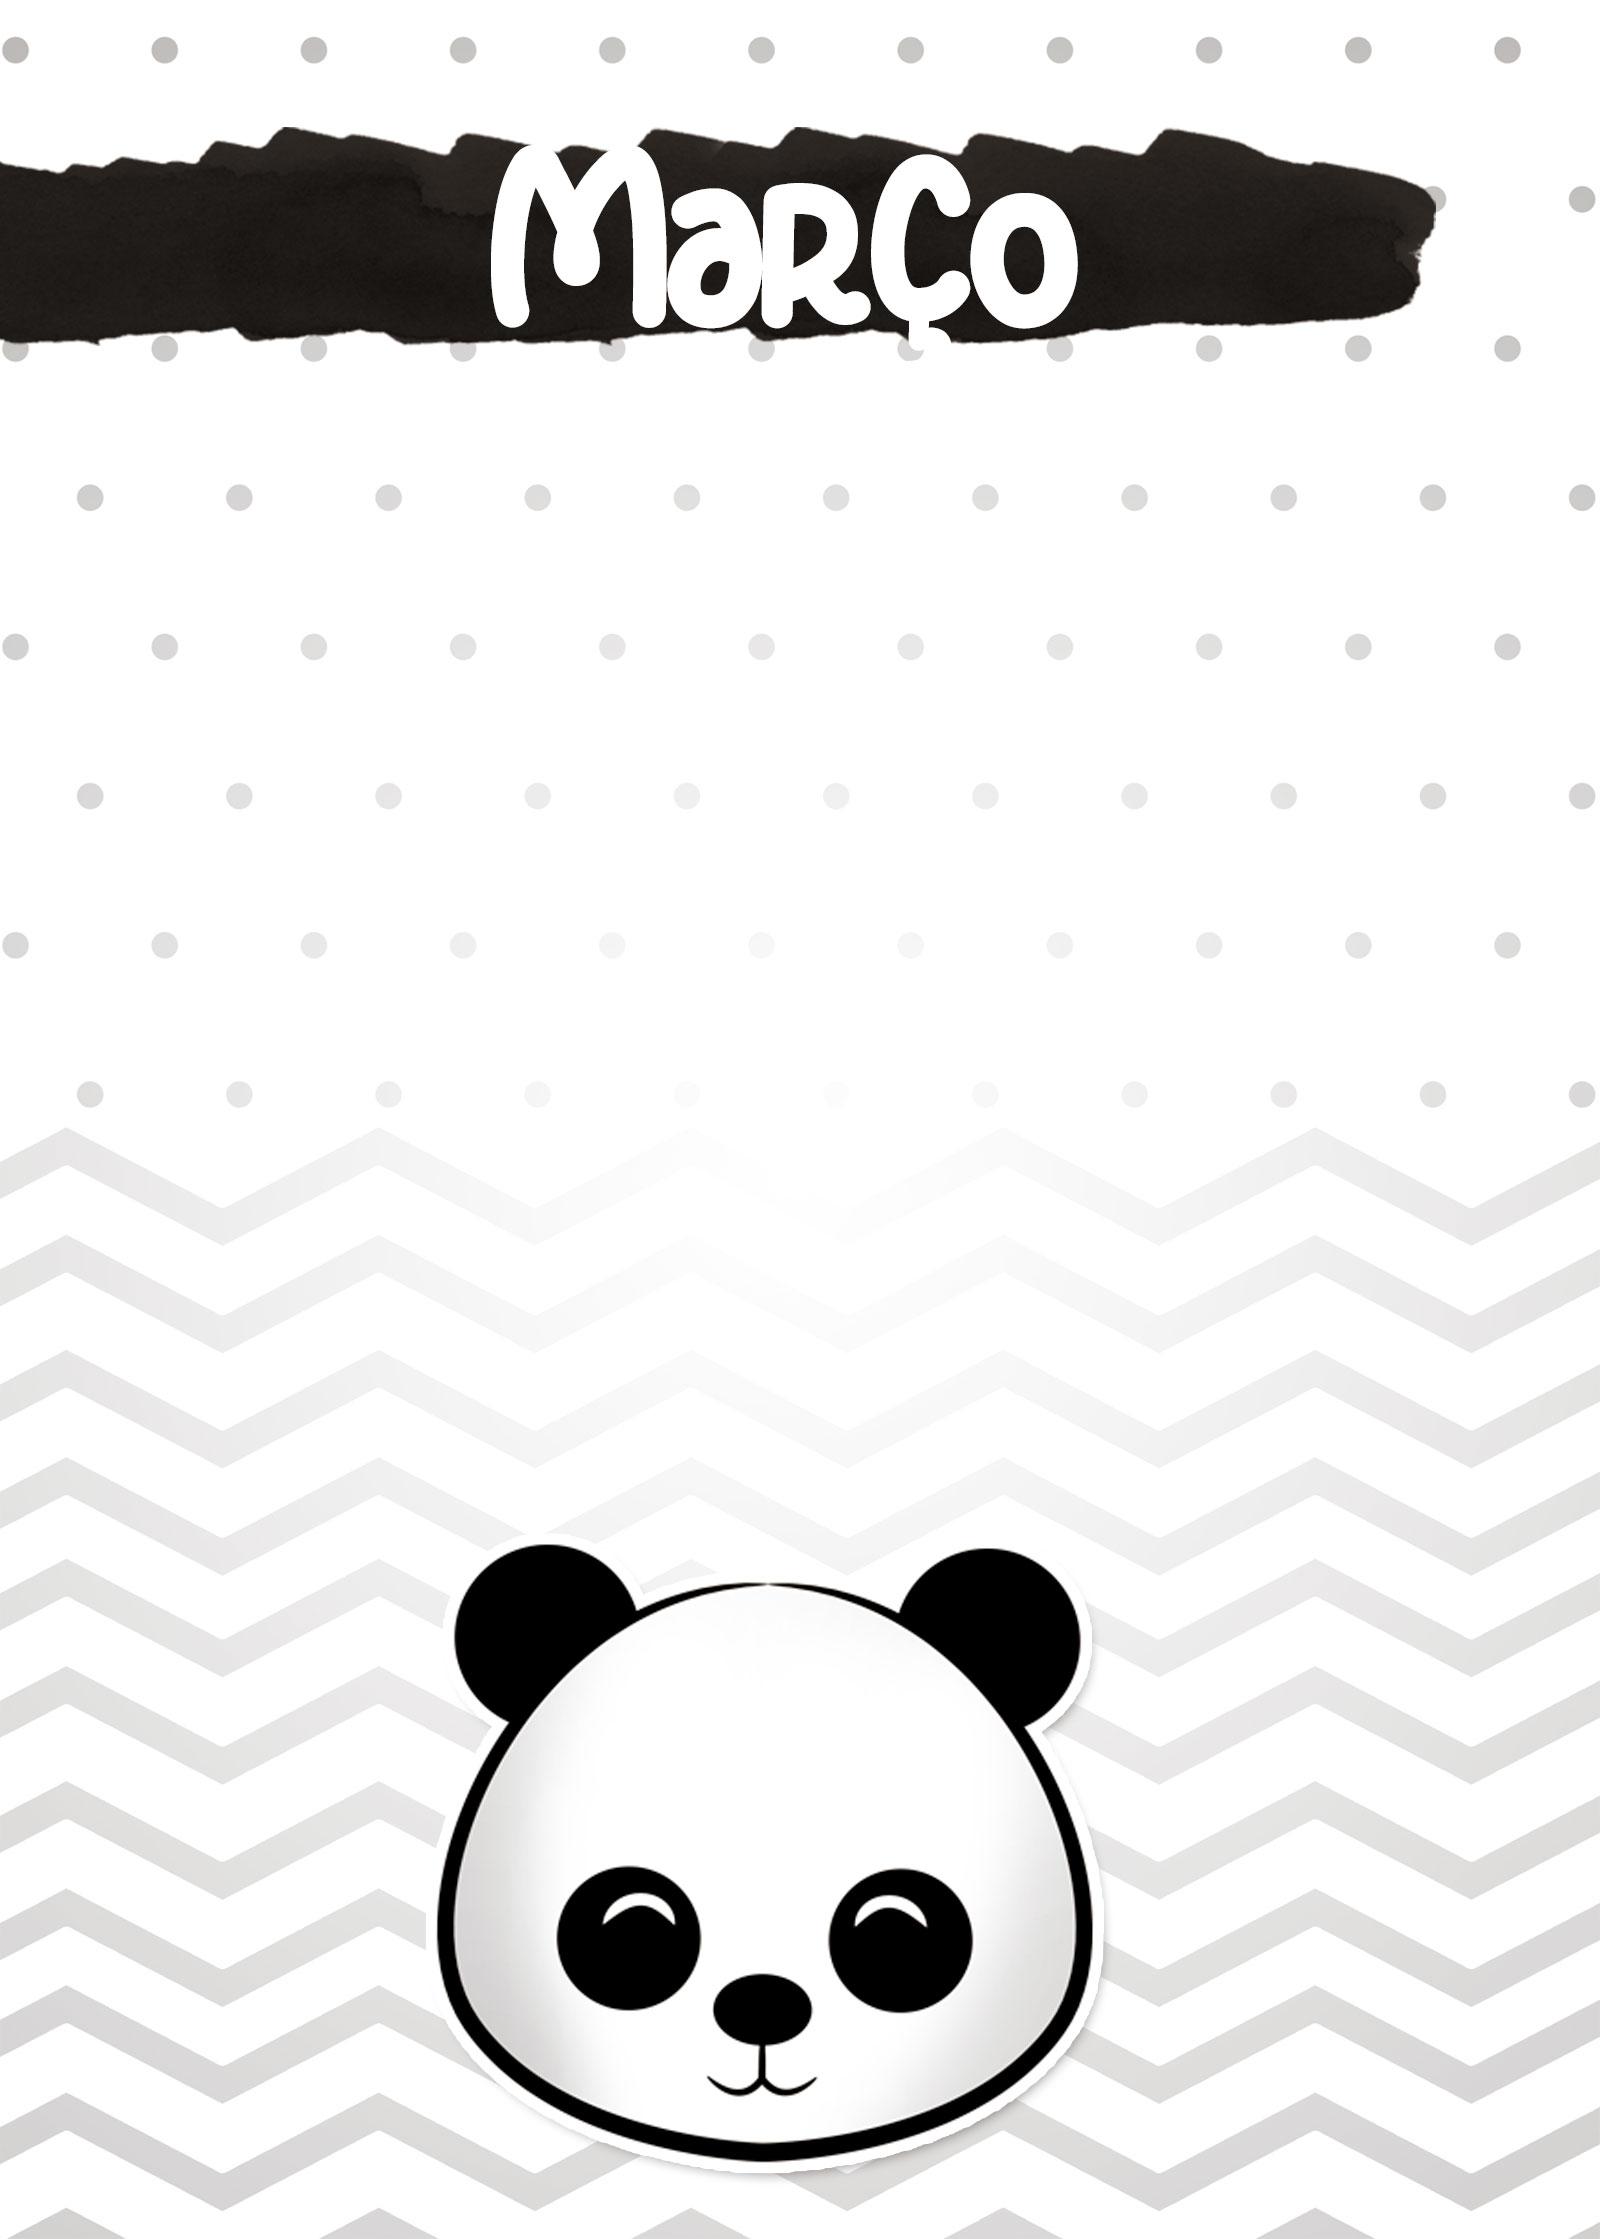 Planners 2020 Panda Menino marco